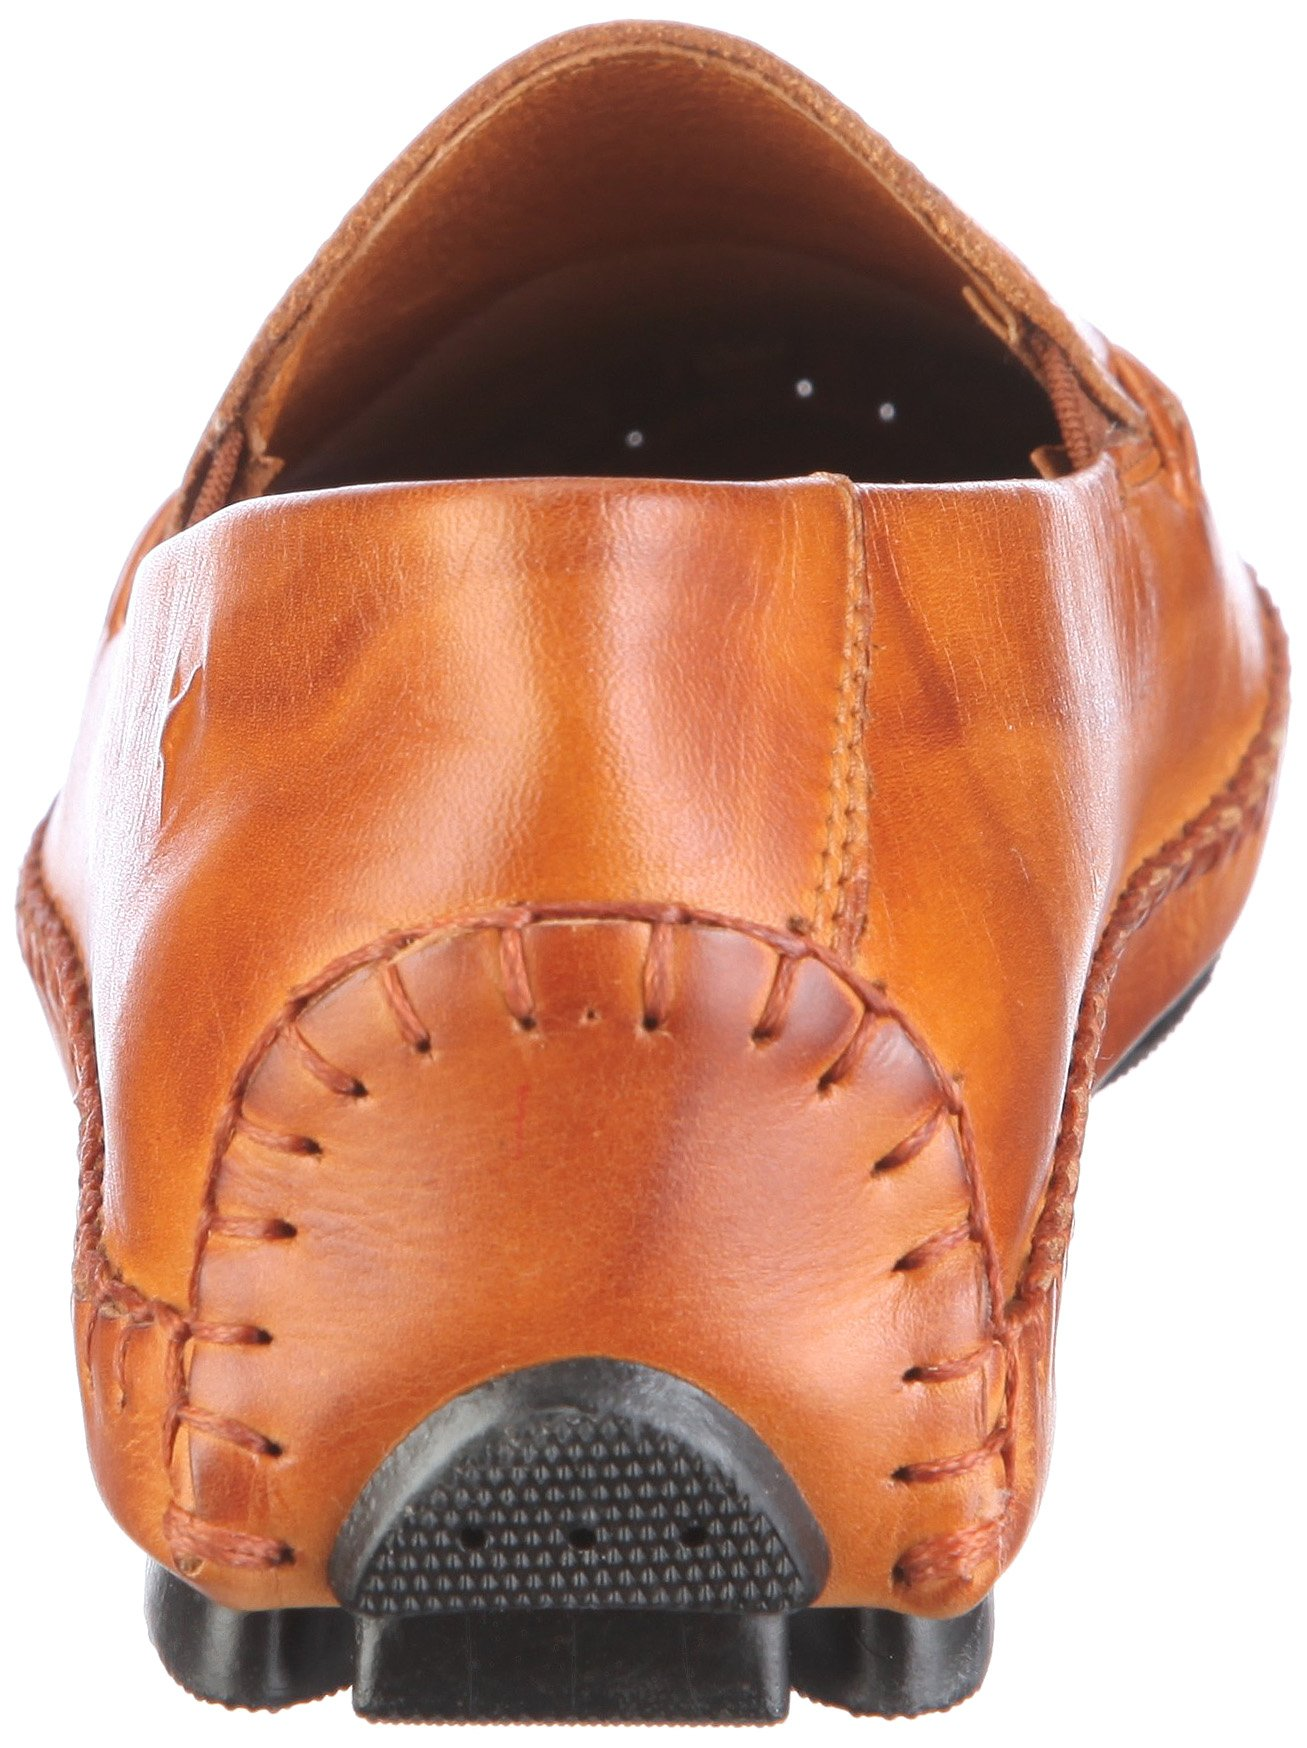 Pikolinos Women's Jerez Slip-On Loafer,Brandy/Brown,39 EU/8.5-9 M US by Pikolinos (Image #2)